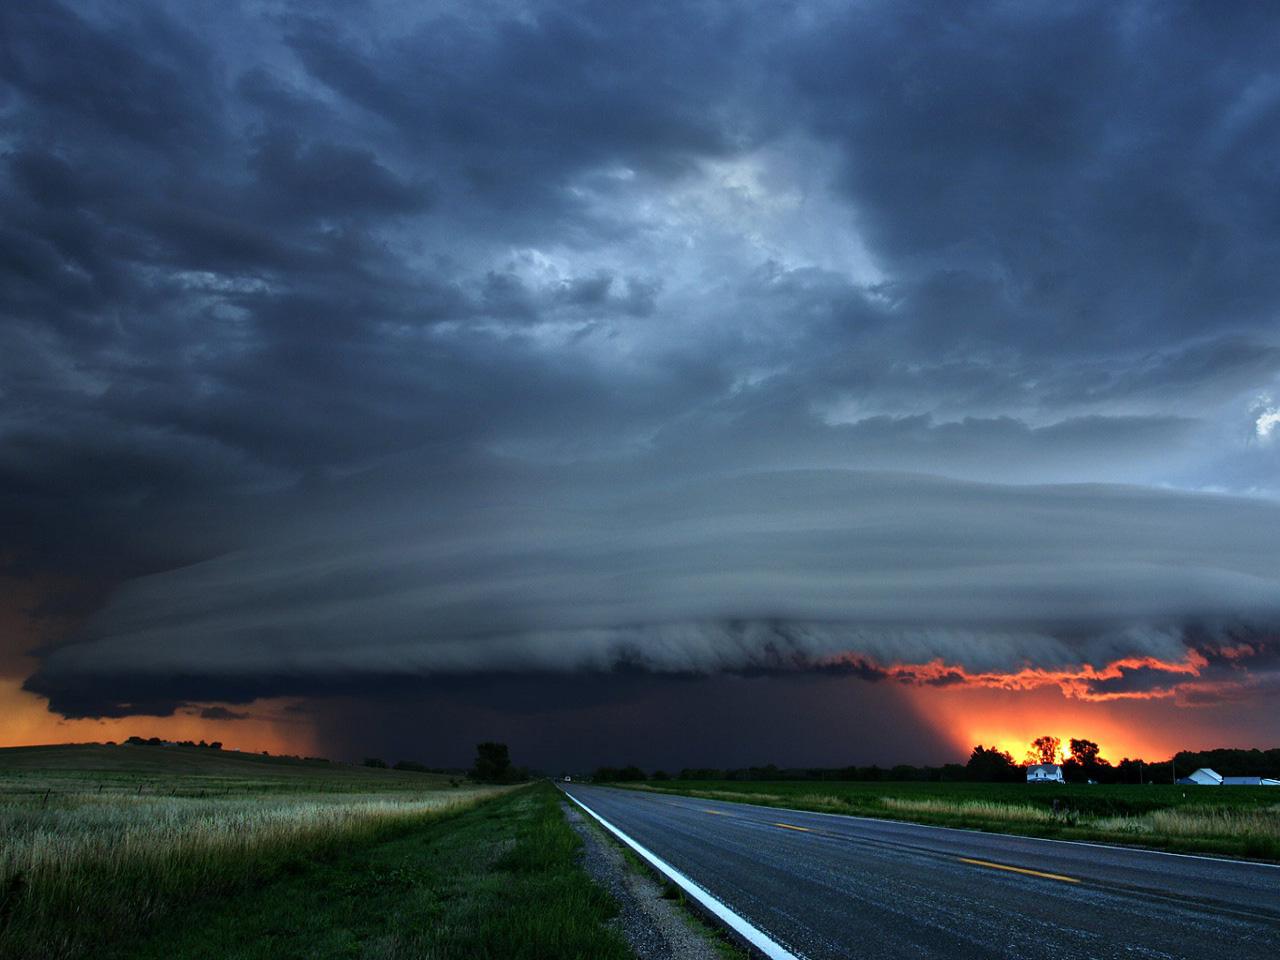 Tornados Im 225 Genes De Tornados Fotos